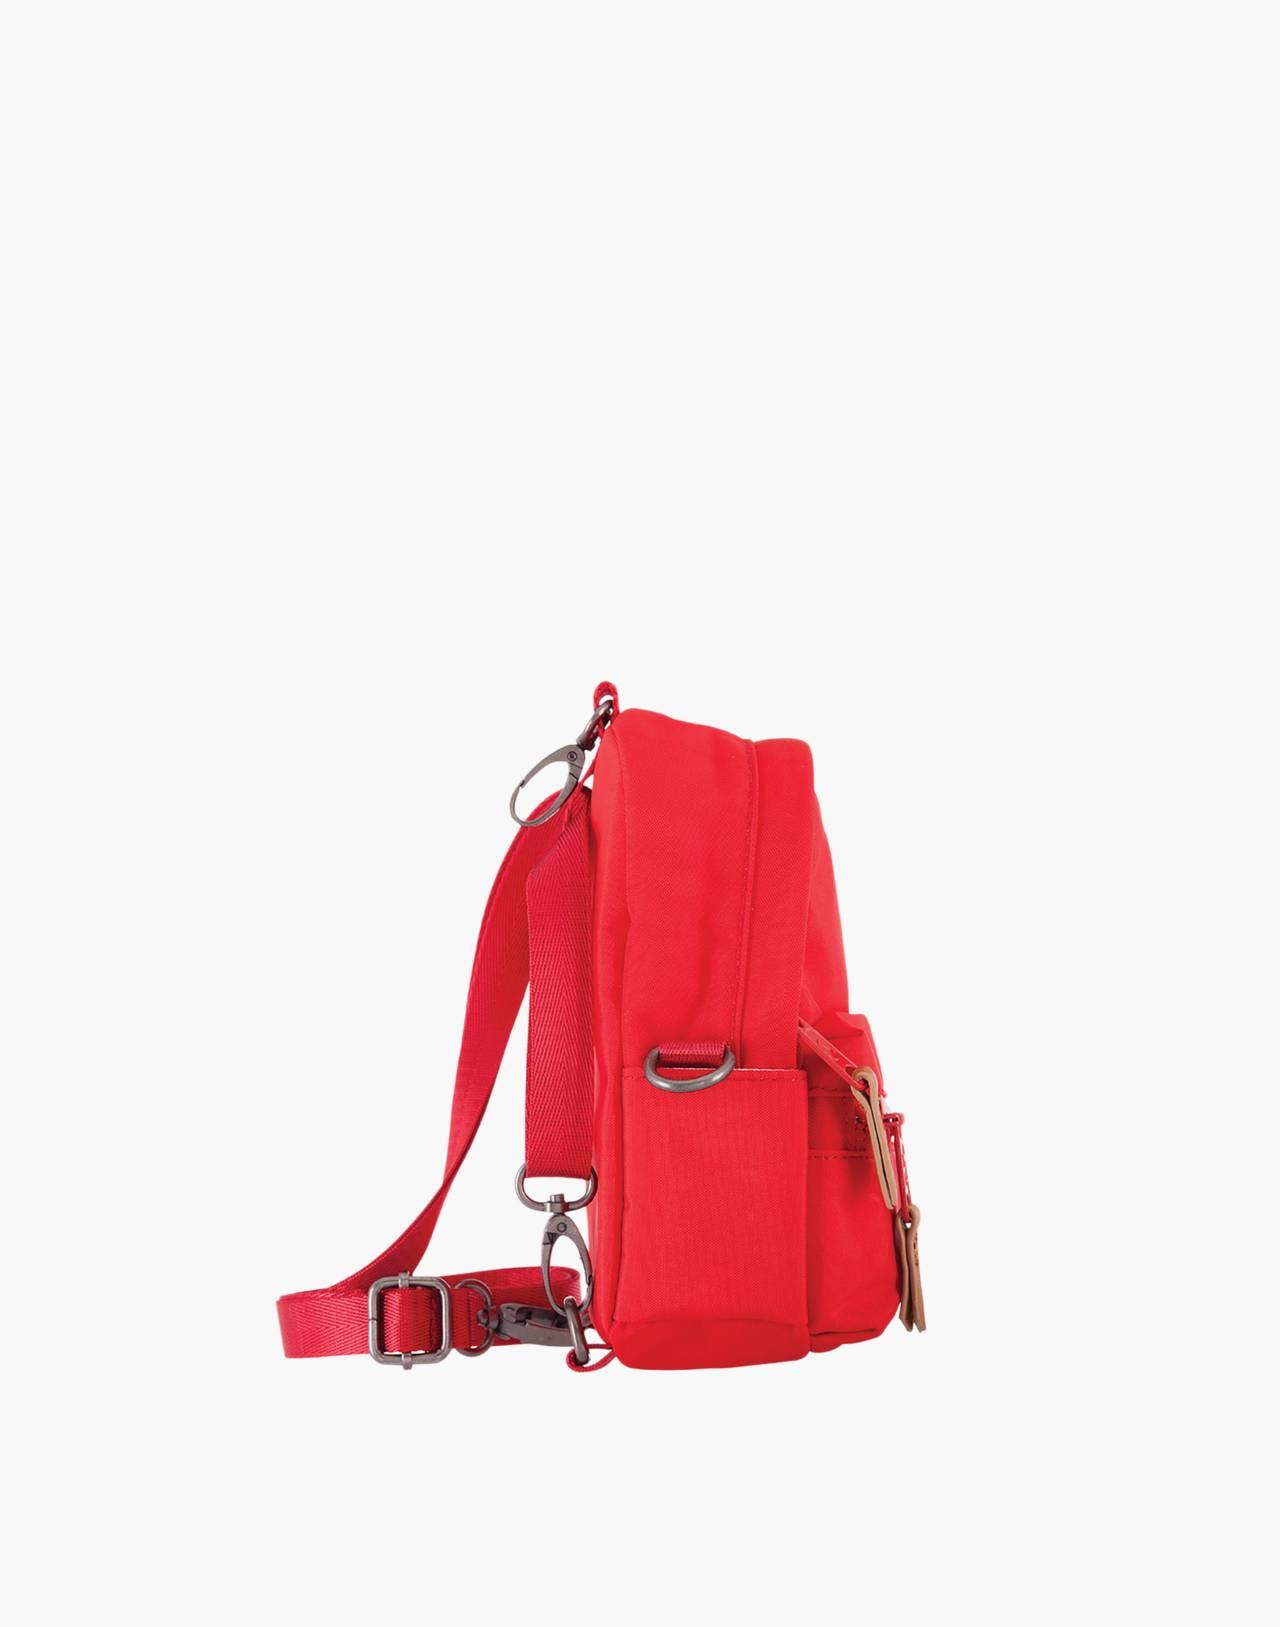 LOLA™ Mondo Stargazer Mini Convertible Backpack in red image 3